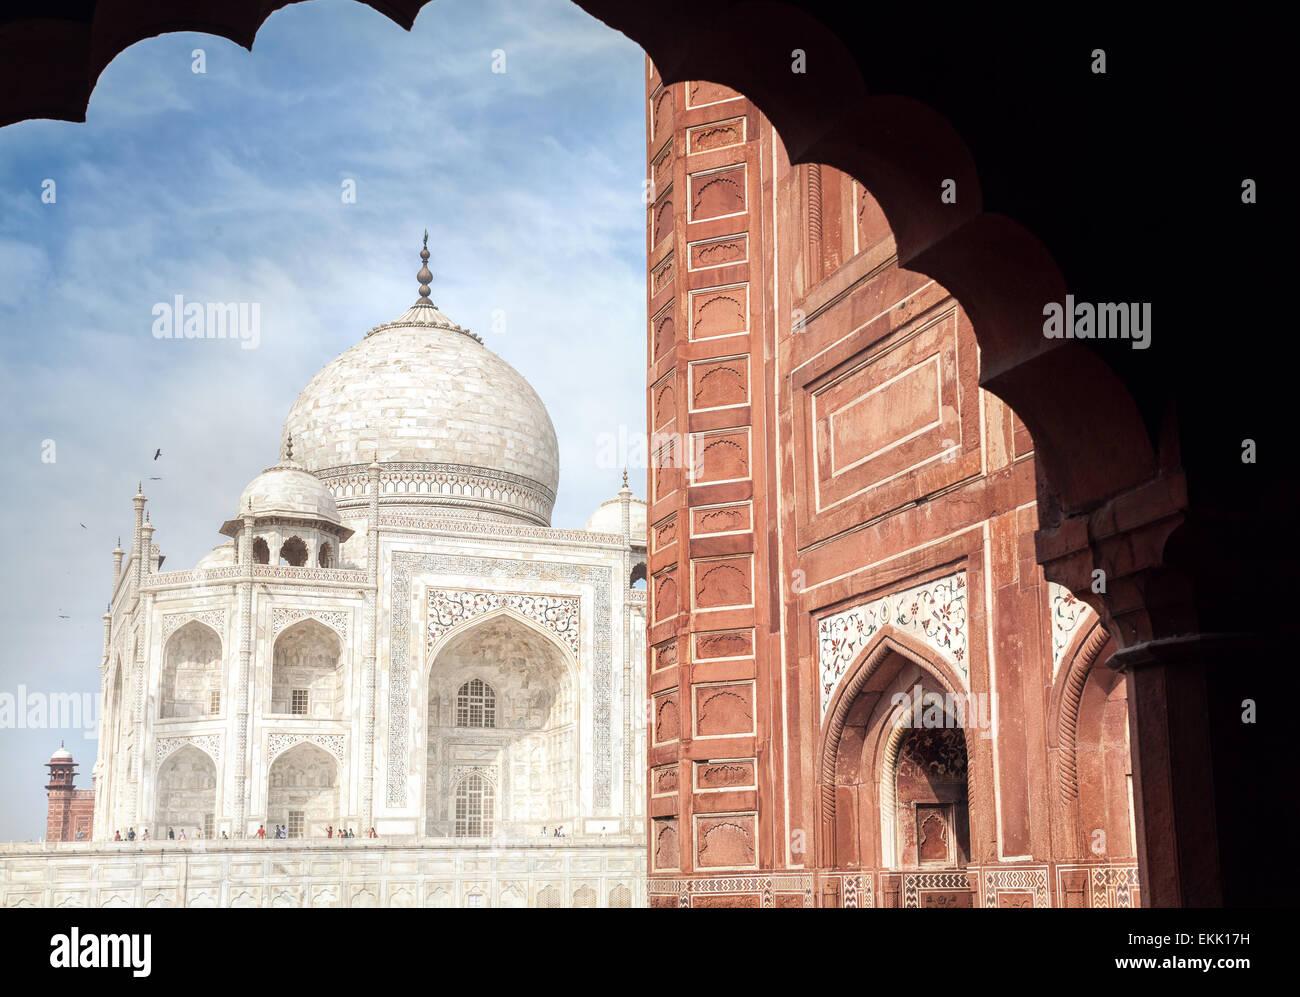 Taj Mahal tomba e moschea nell'arco al blue sky in Agra, Uttar Pradesh, India Immagini Stock